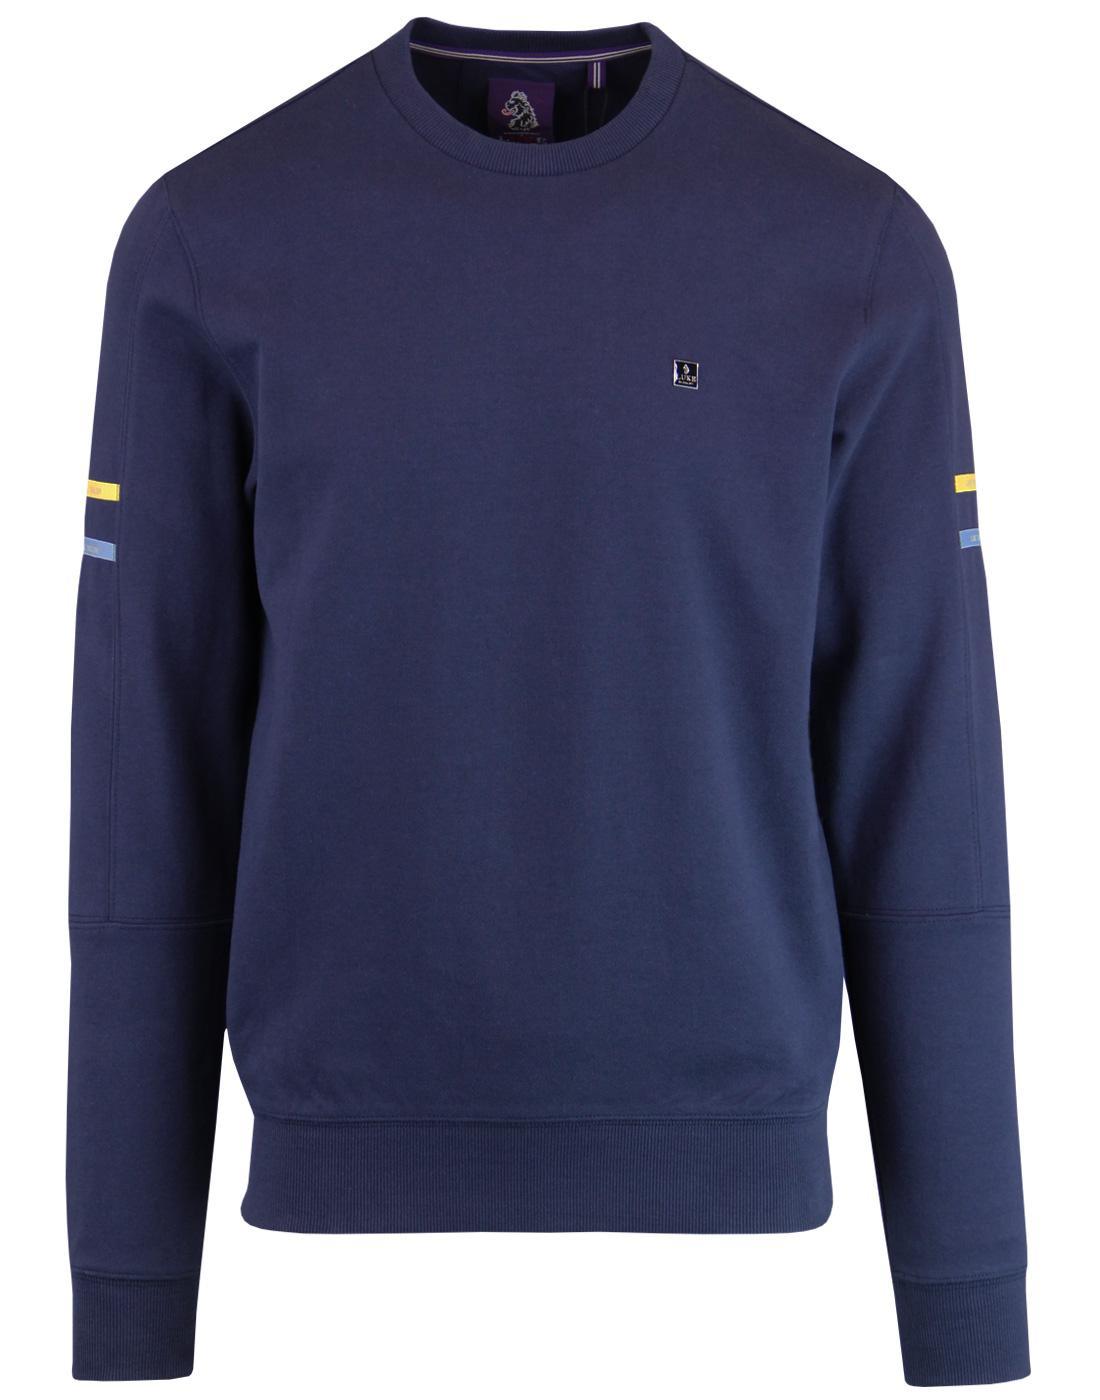 TTS LUKE Retro Technical Tailor Stripe Sweatshirt